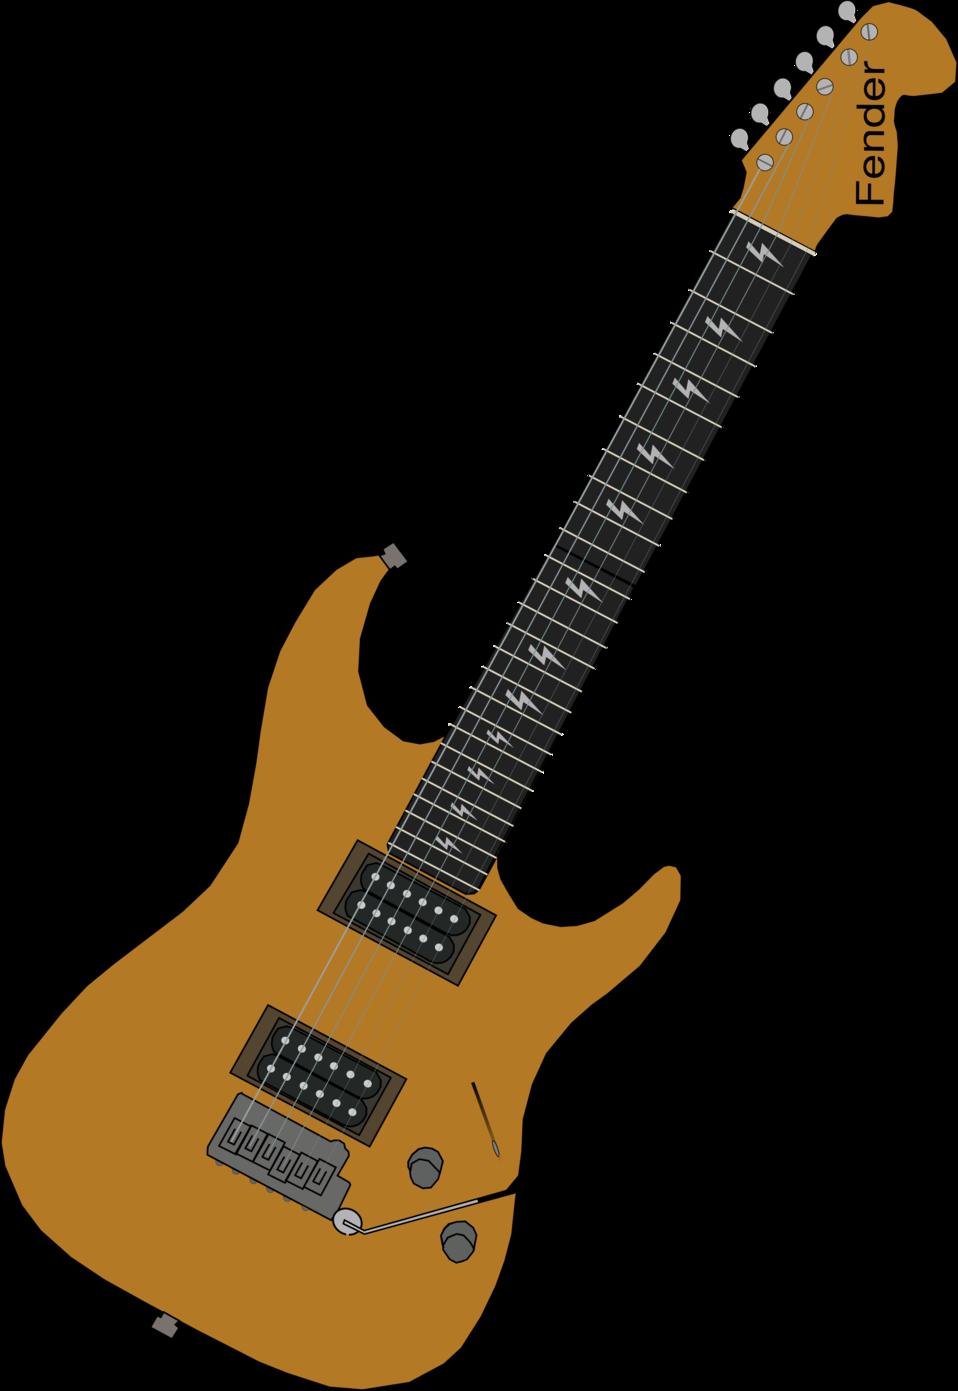 Clipart guitar public domain. Clip art image id